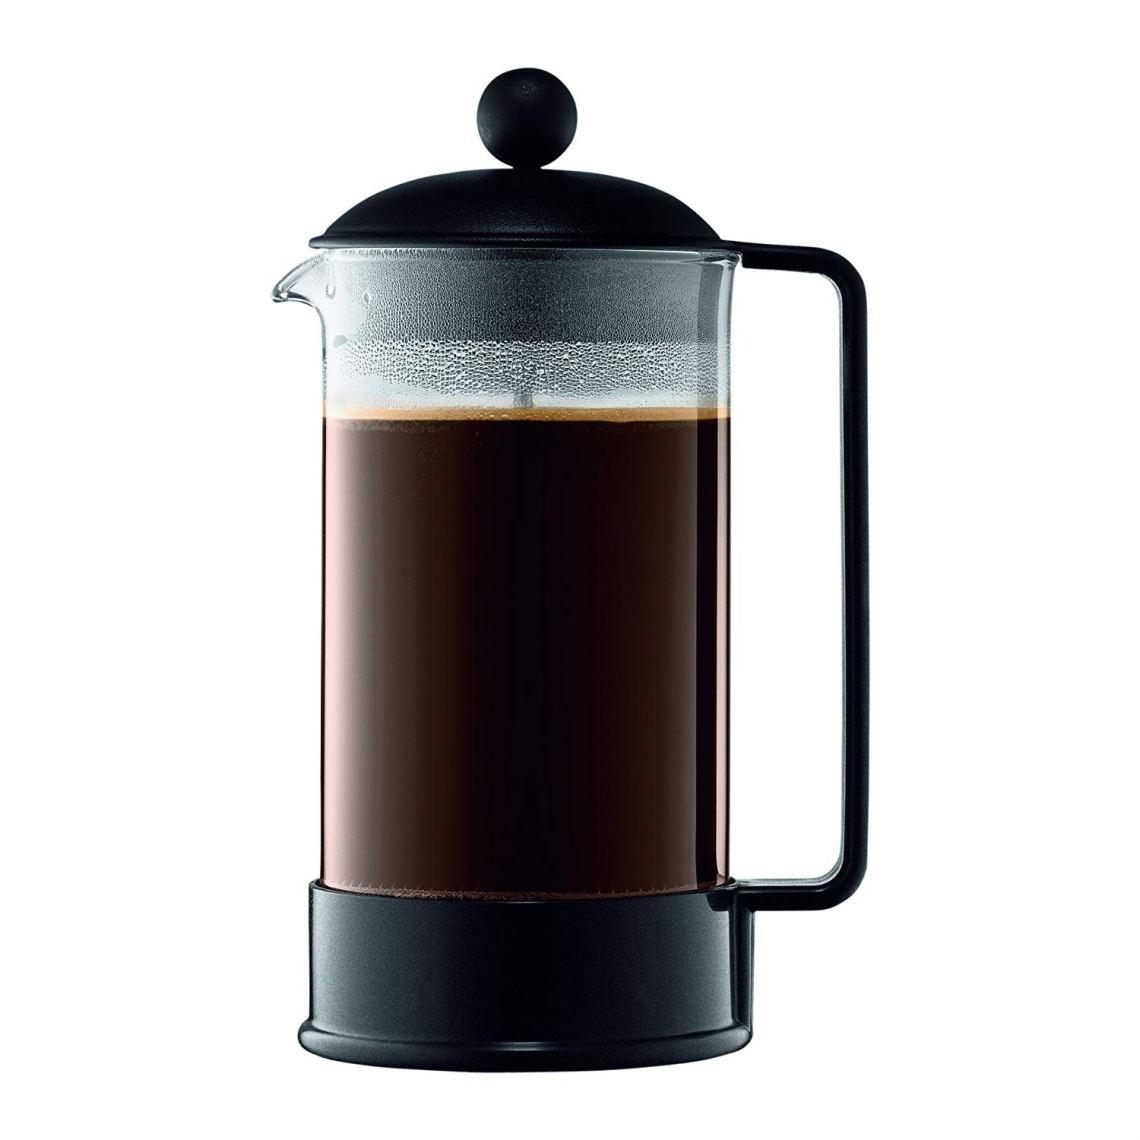 Bodum Brazil French Press Coffee & Tea Maker